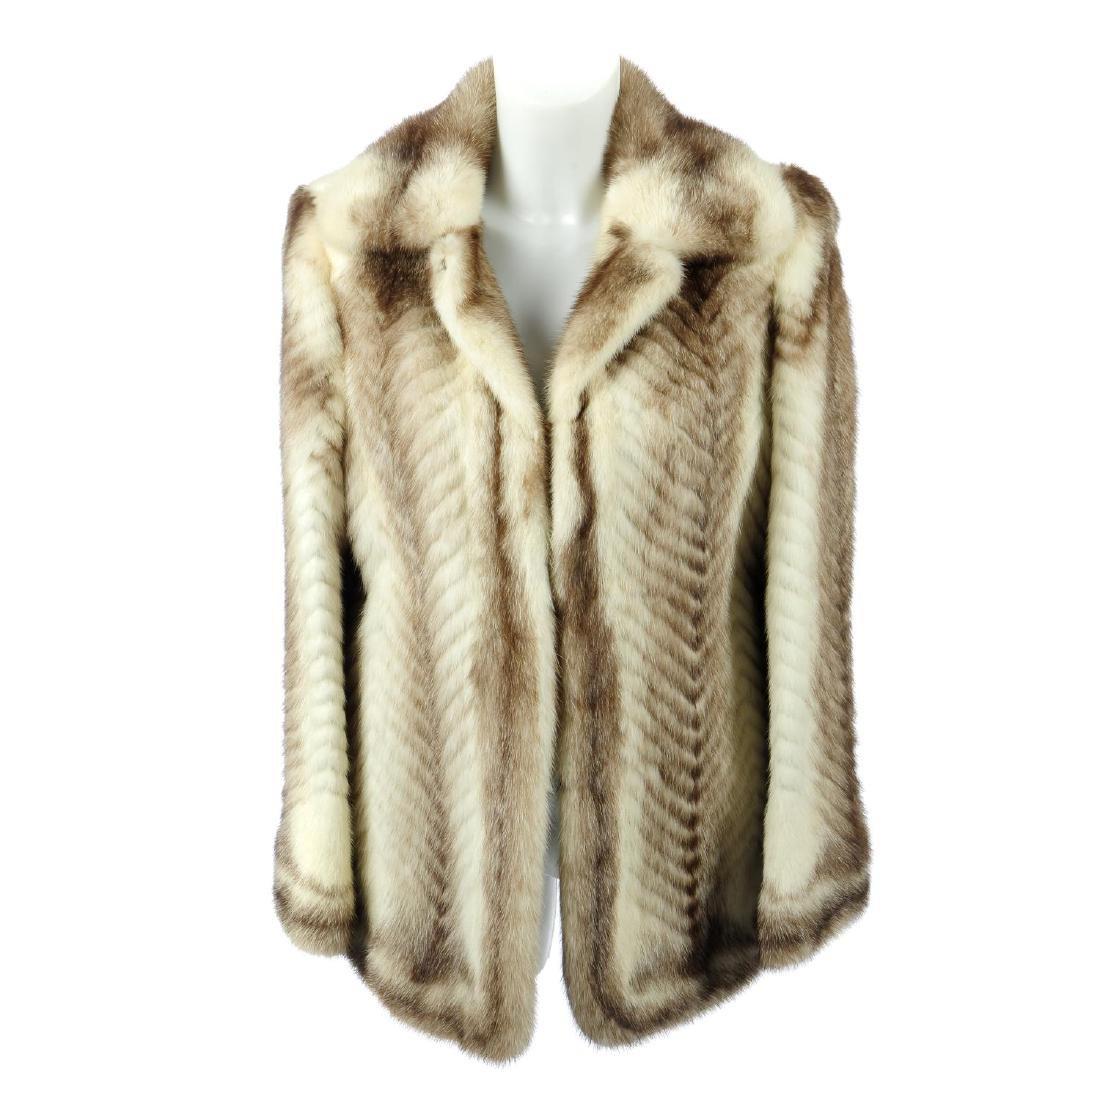 A chevron striped mink jacket. Featuring a pieced